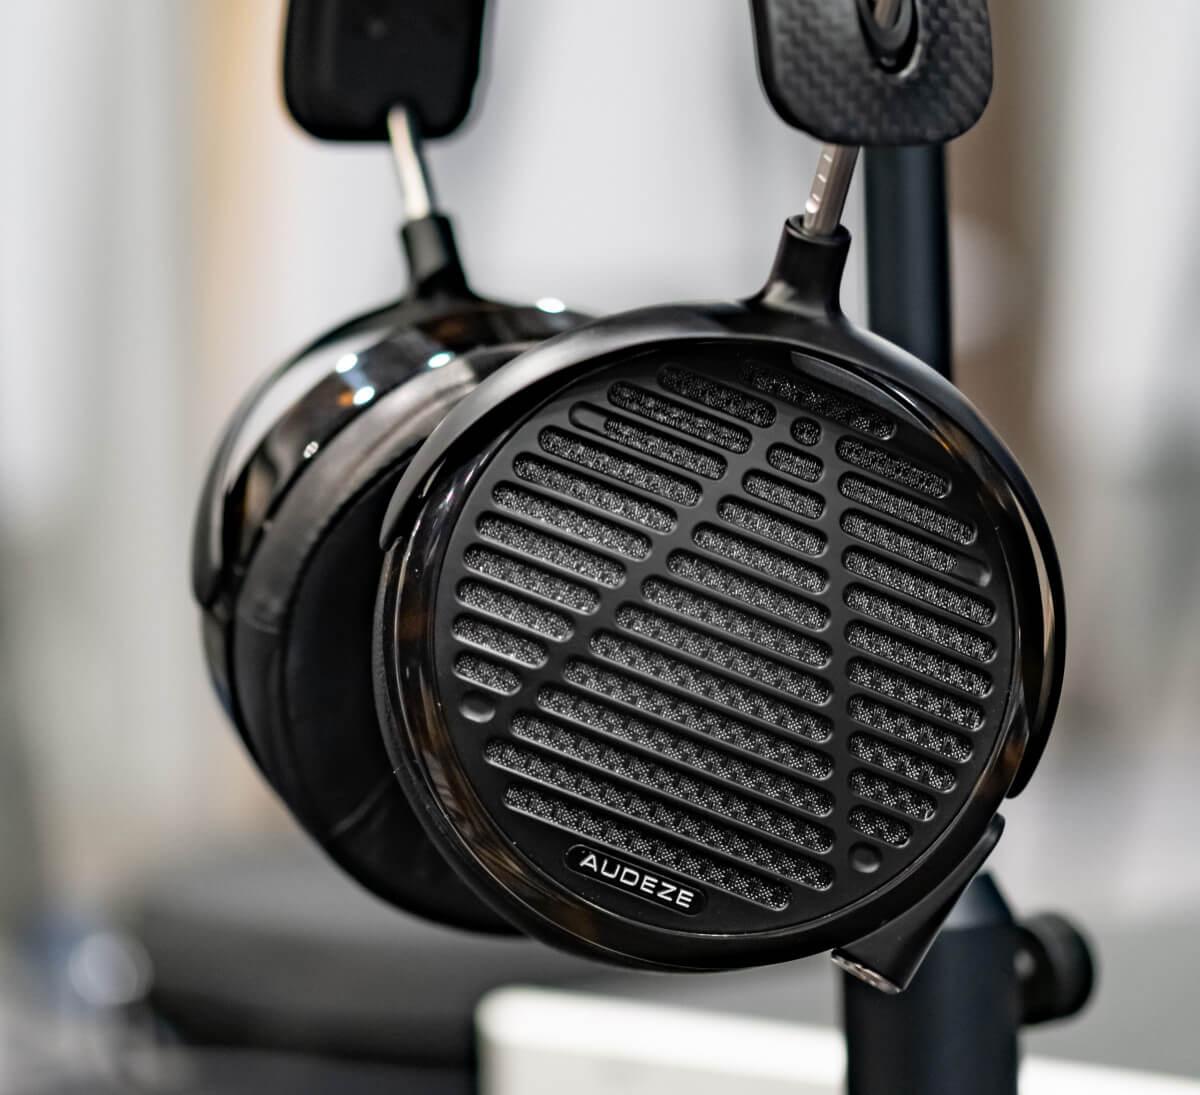 Audeze LCD-5 | Headphones.com